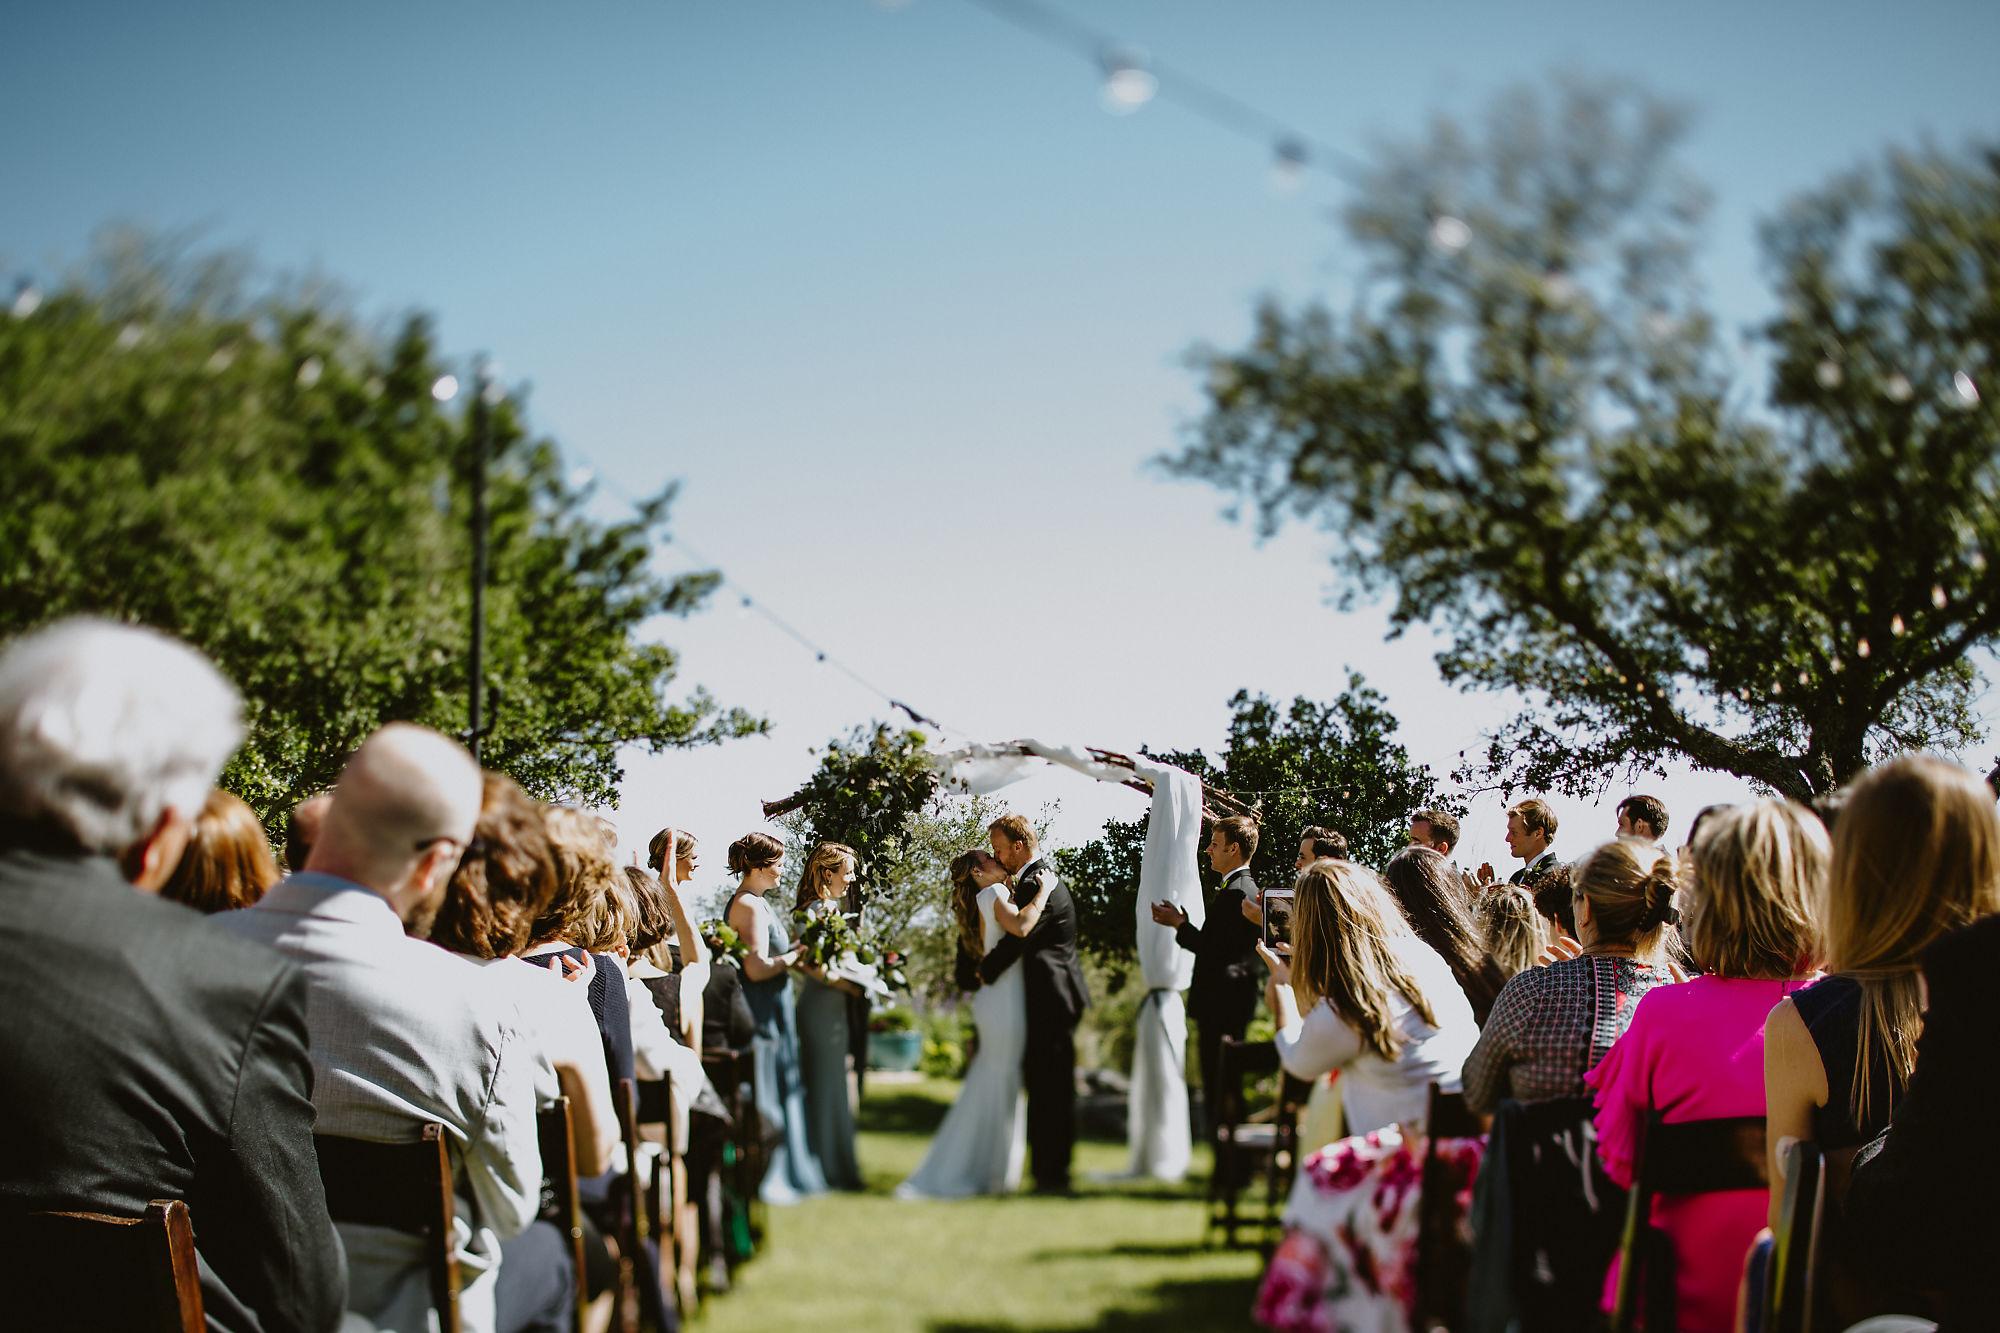 molly_jac_austin_wedding_photos152821_2.jpg